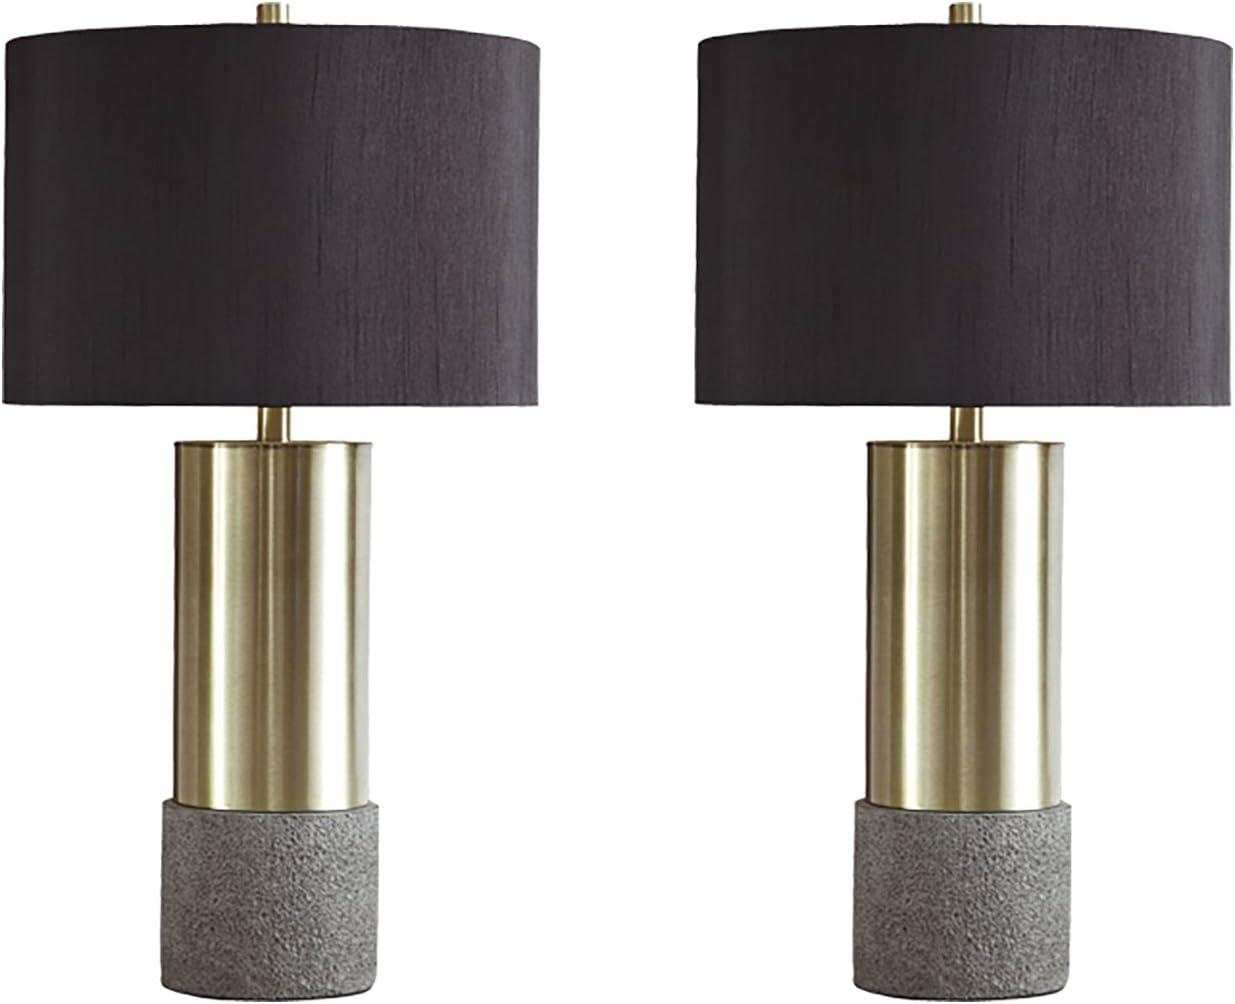 Amazon Com Signature Design By Ashley Jacek Table Lamps Set Of 2 Contemporary Gray Brass Finish Home Improvement